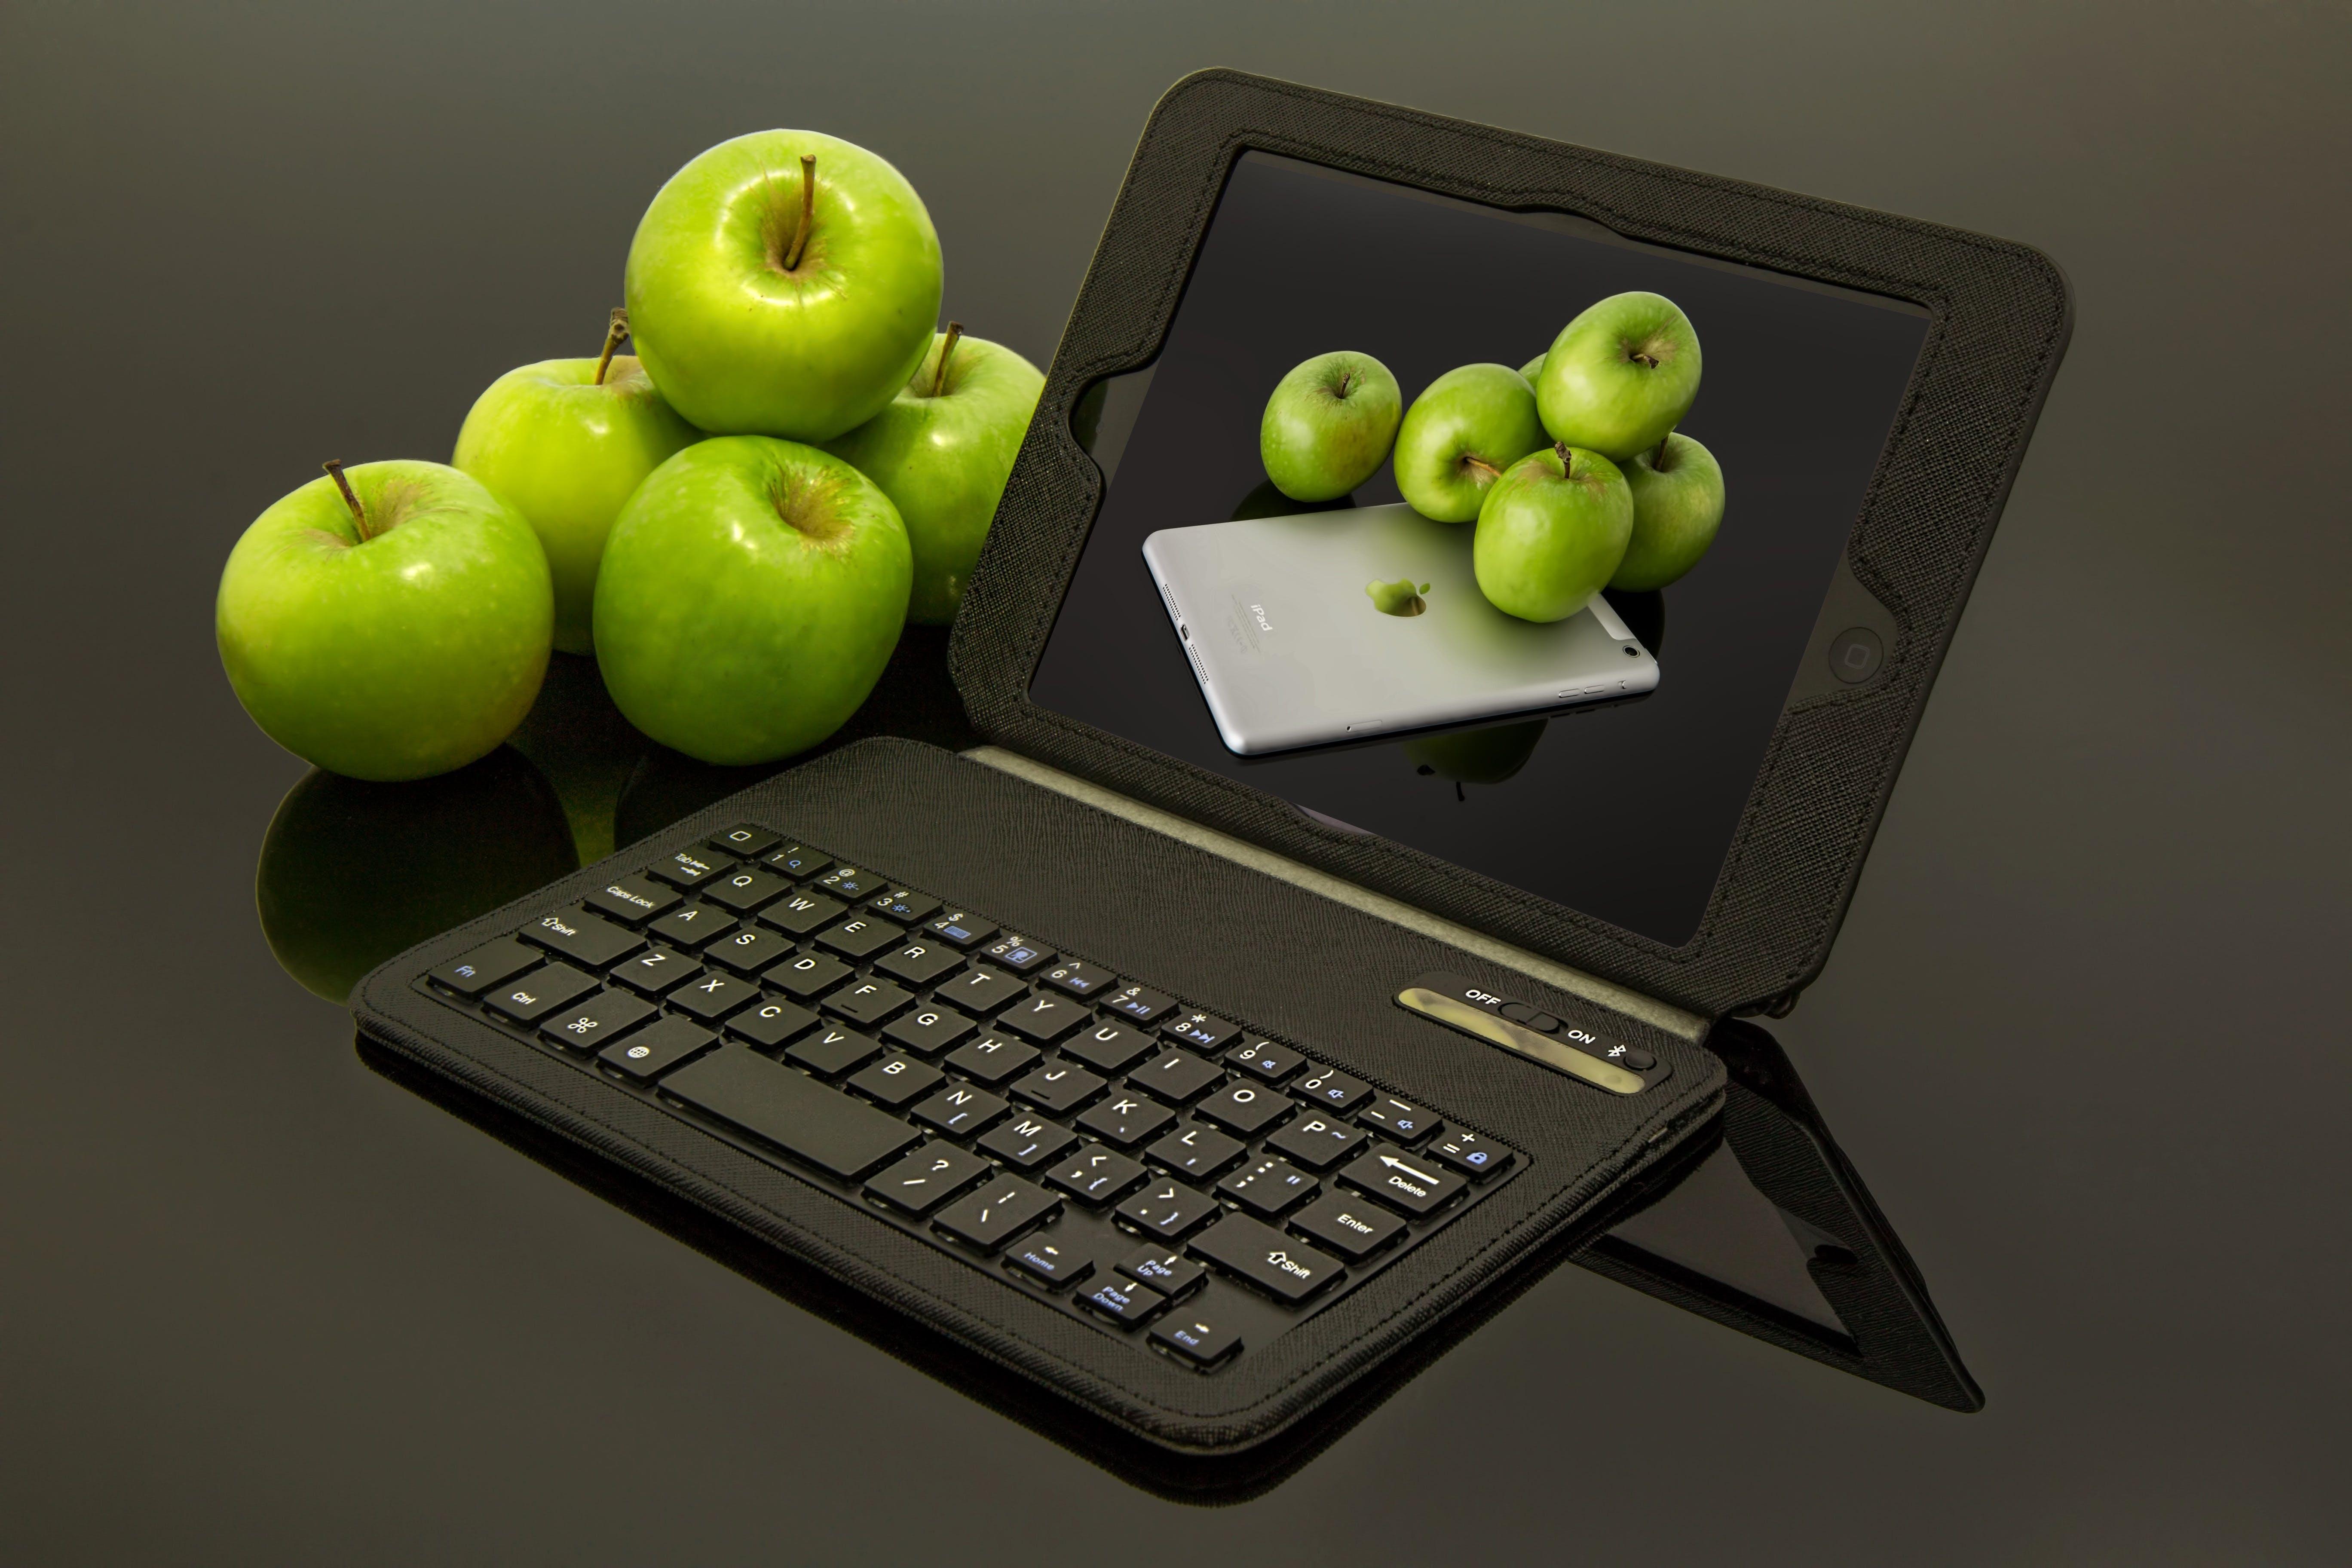 Gratis lagerfoto af Apple, frugter, gadget, ipad